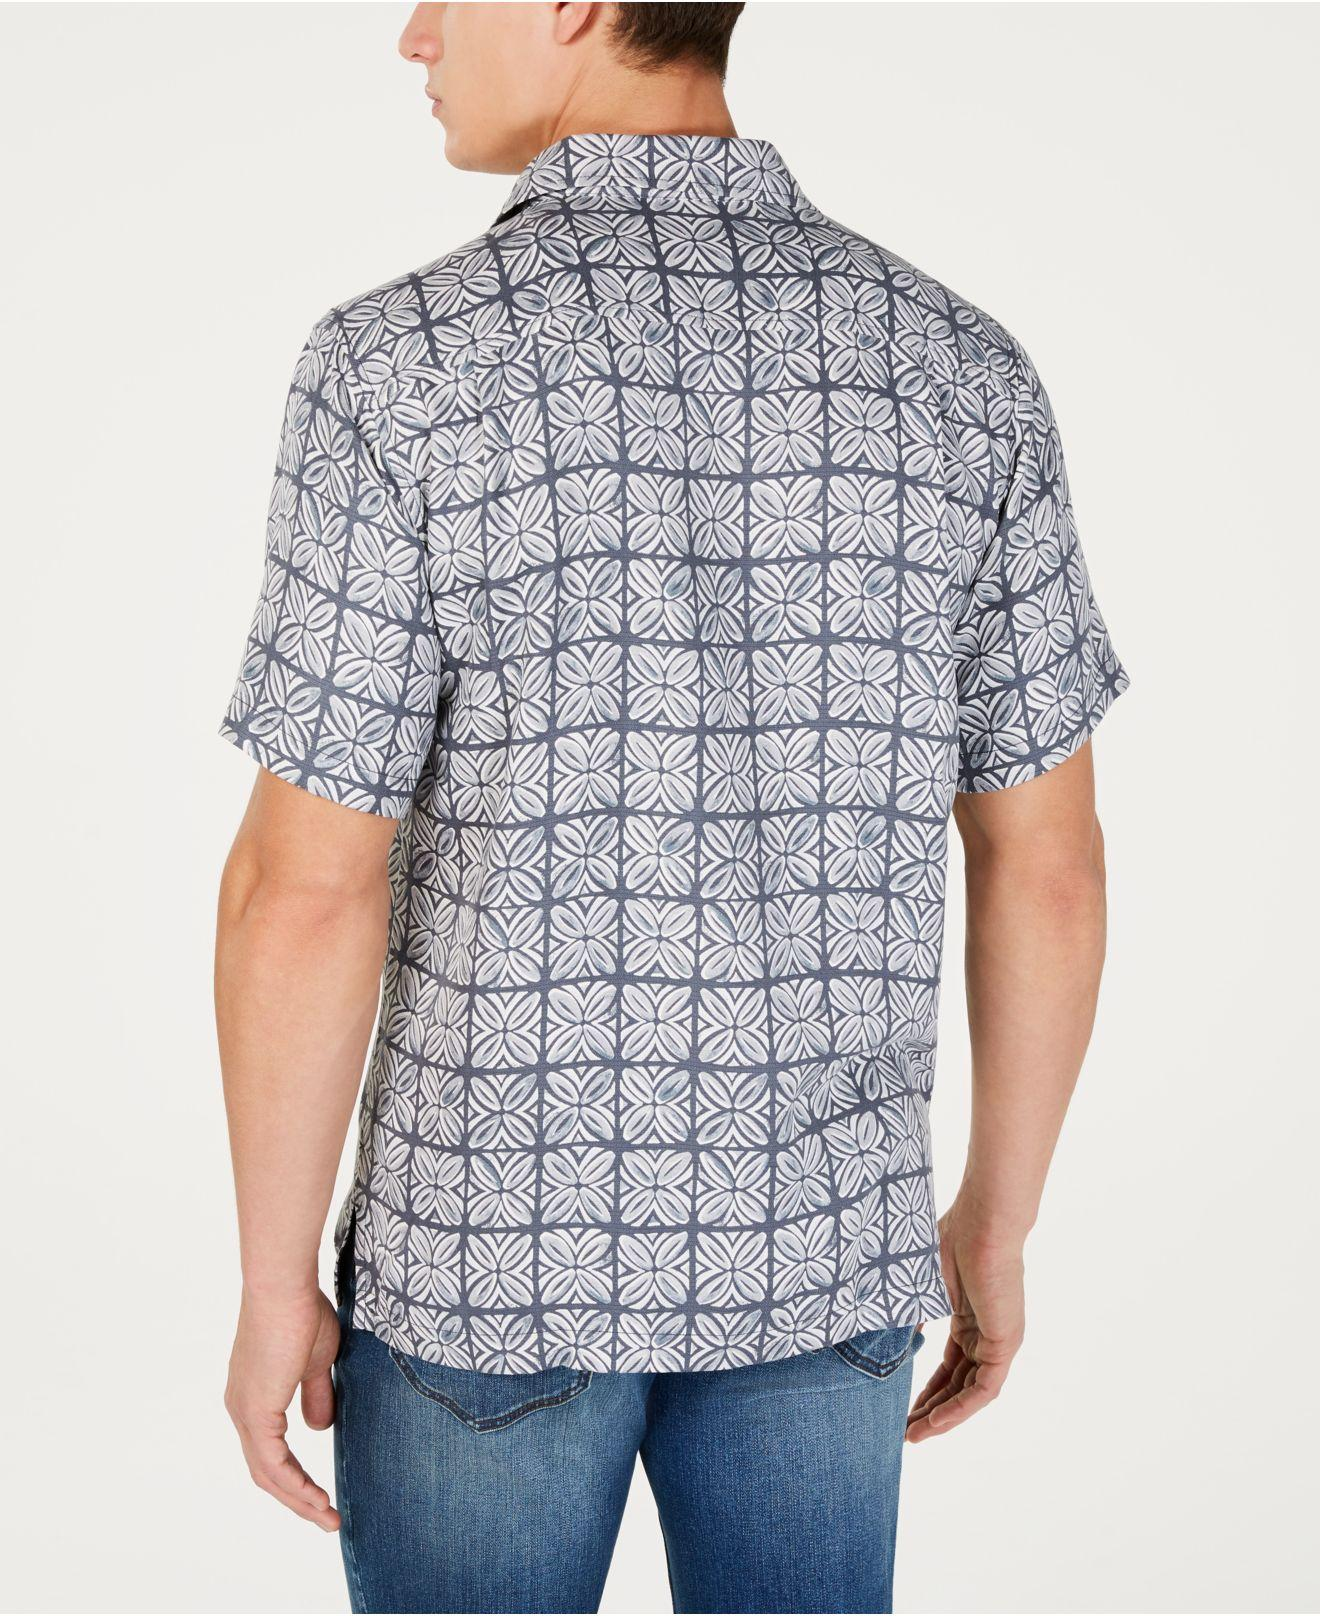 c5a7da6cf6d Lyst - Tommy Bahama Regular-fit Tonal Geo-print Silk Camp Shirt ...